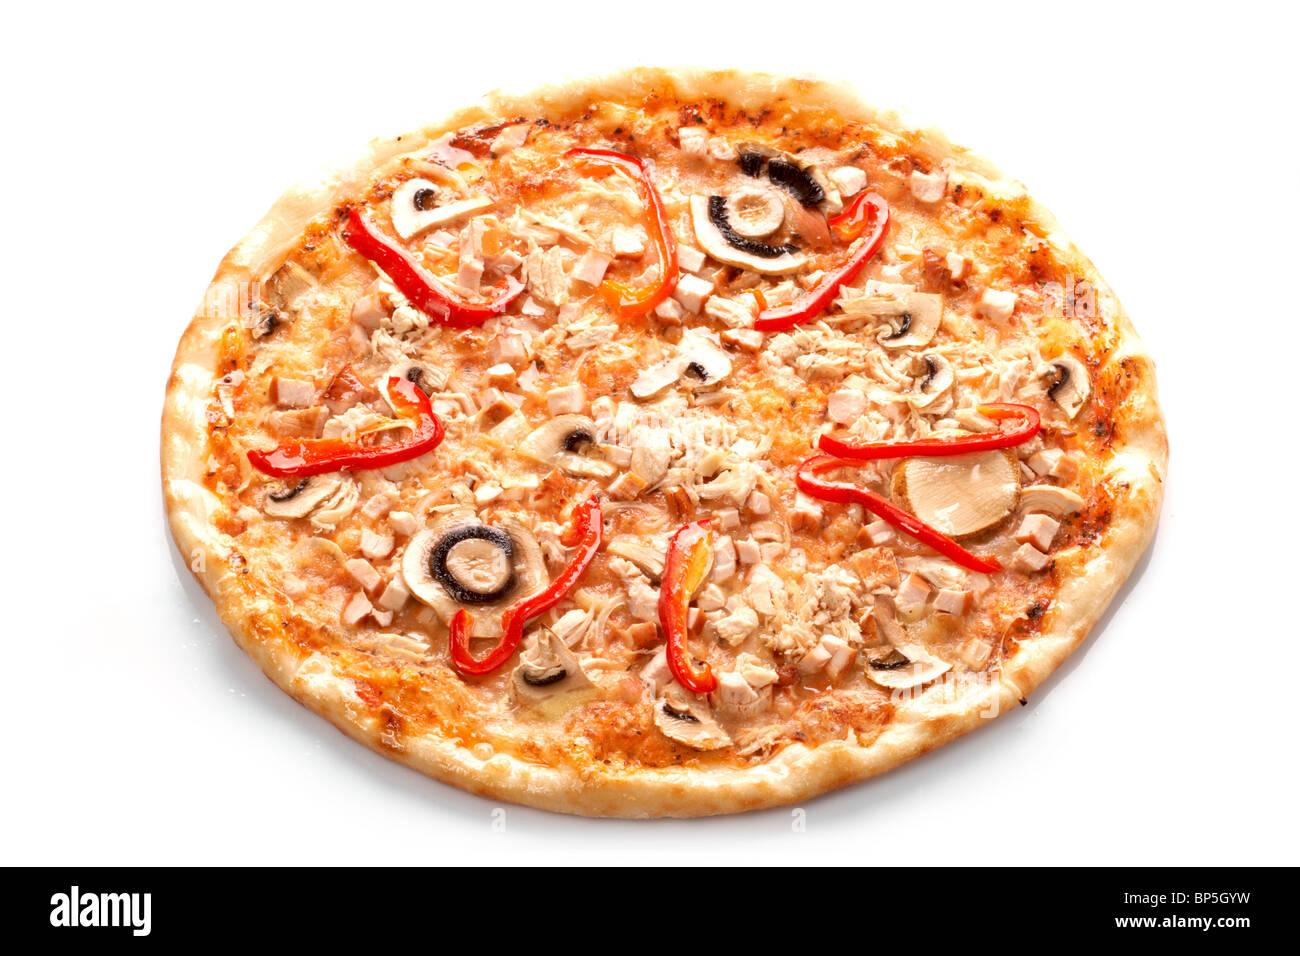 Pizza con champignons Imagen De Stock